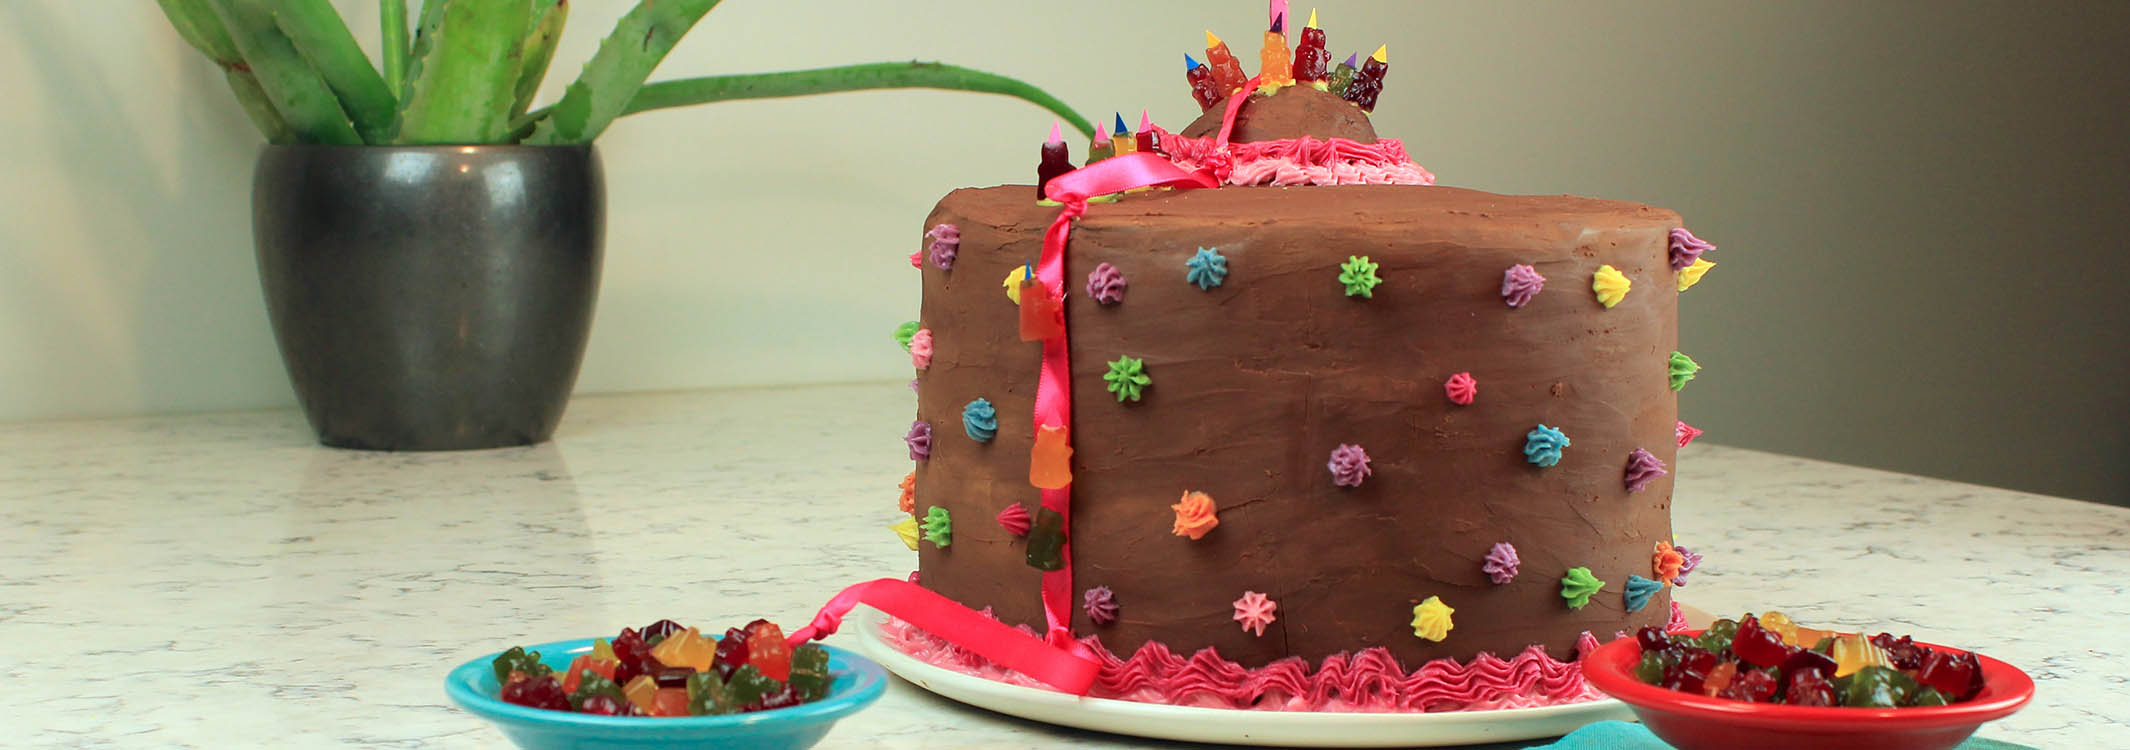 Chocolate Gummy Bear Rainbow Cake Veronica Qubrossi